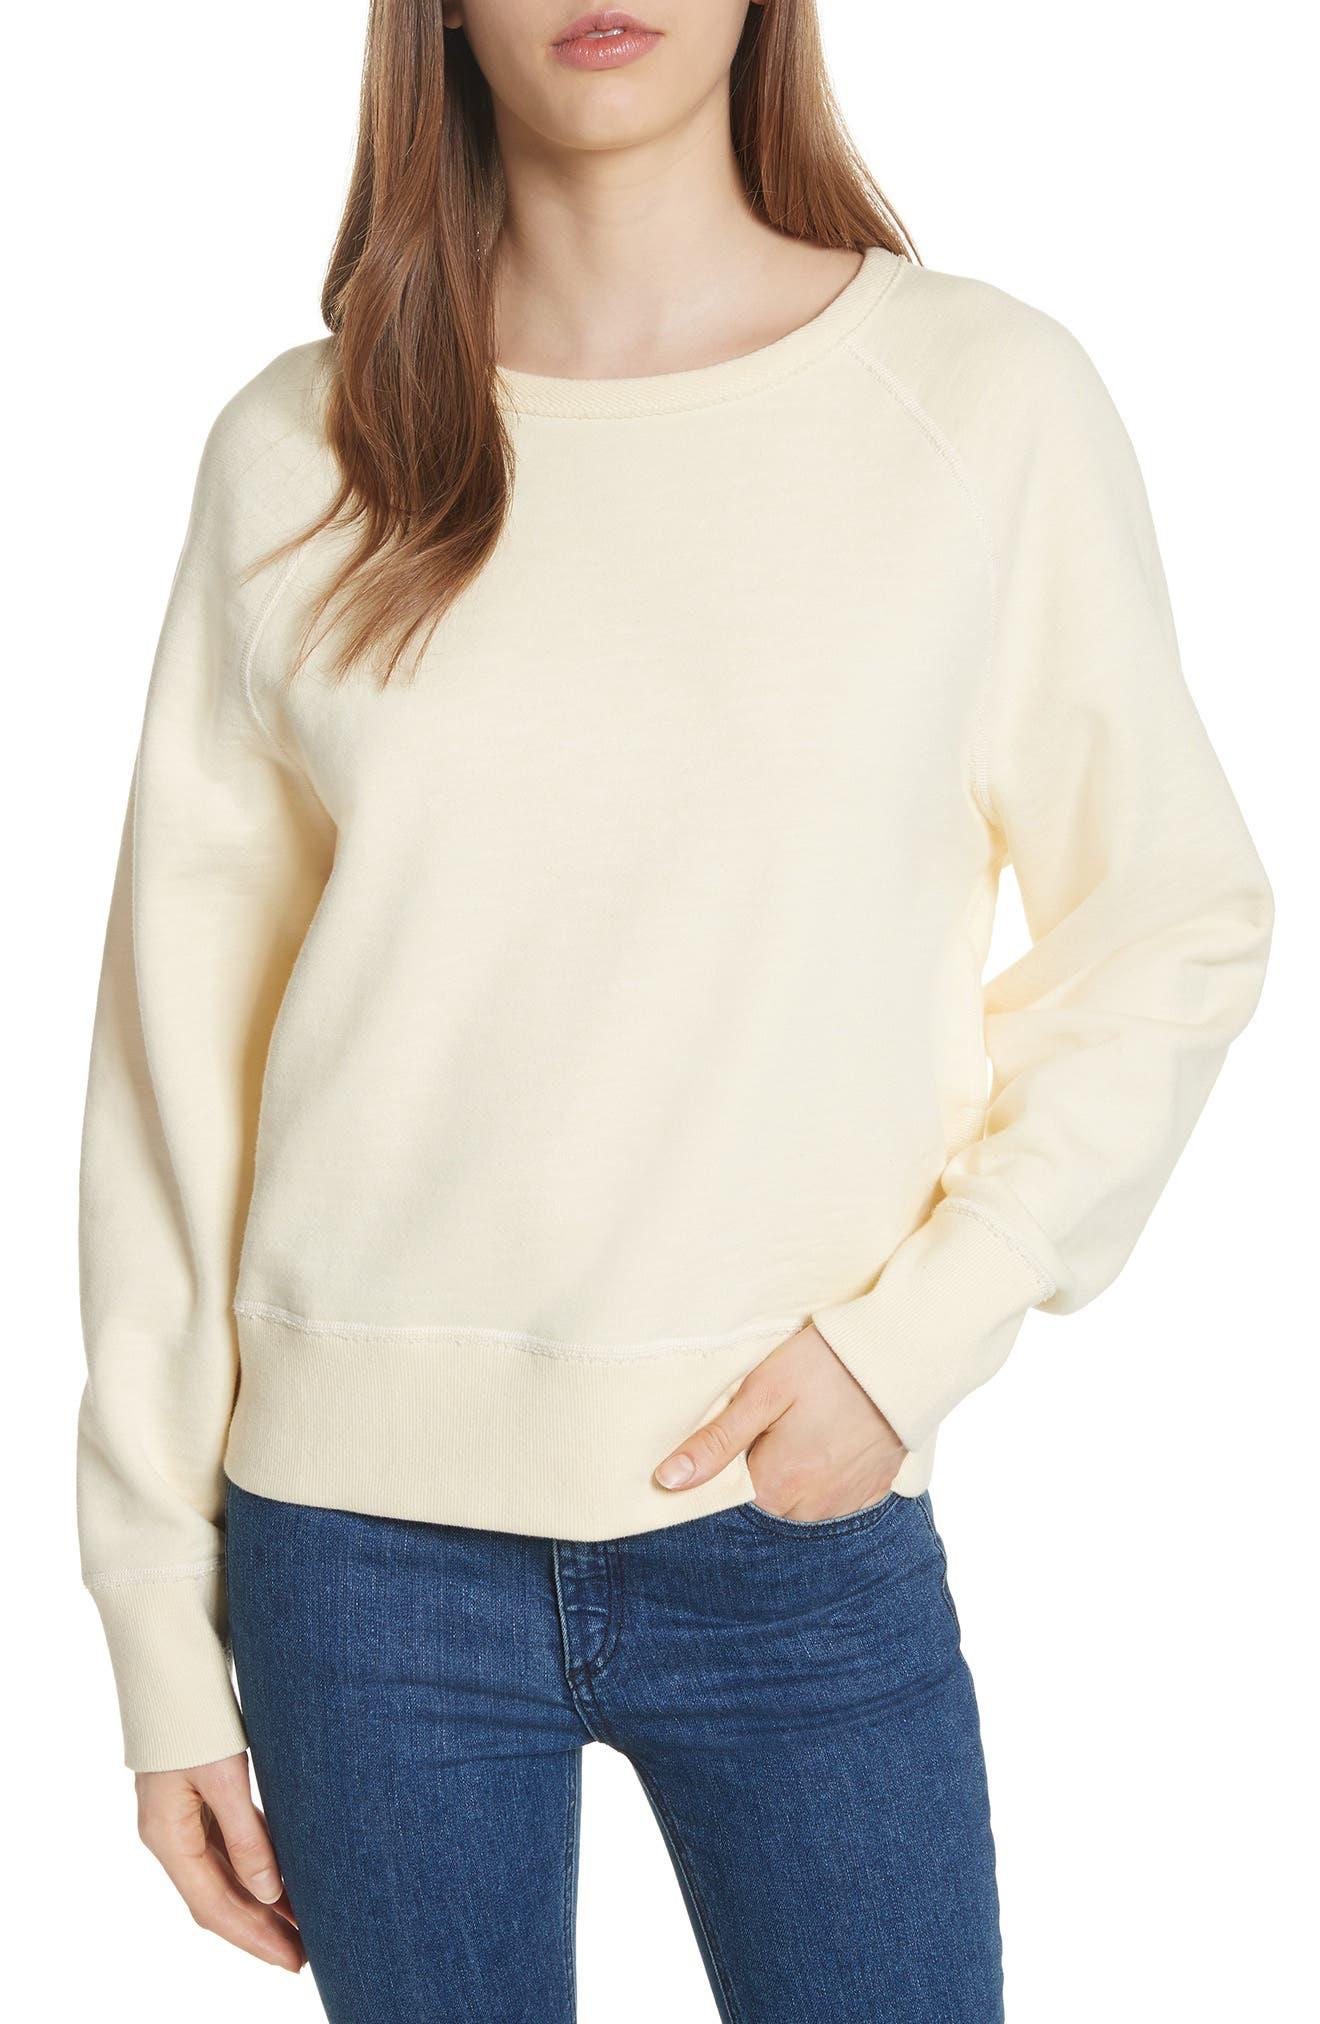 Alternate Image 1 Selected - rag & bone/JEAN The Raglan Sweatshirt